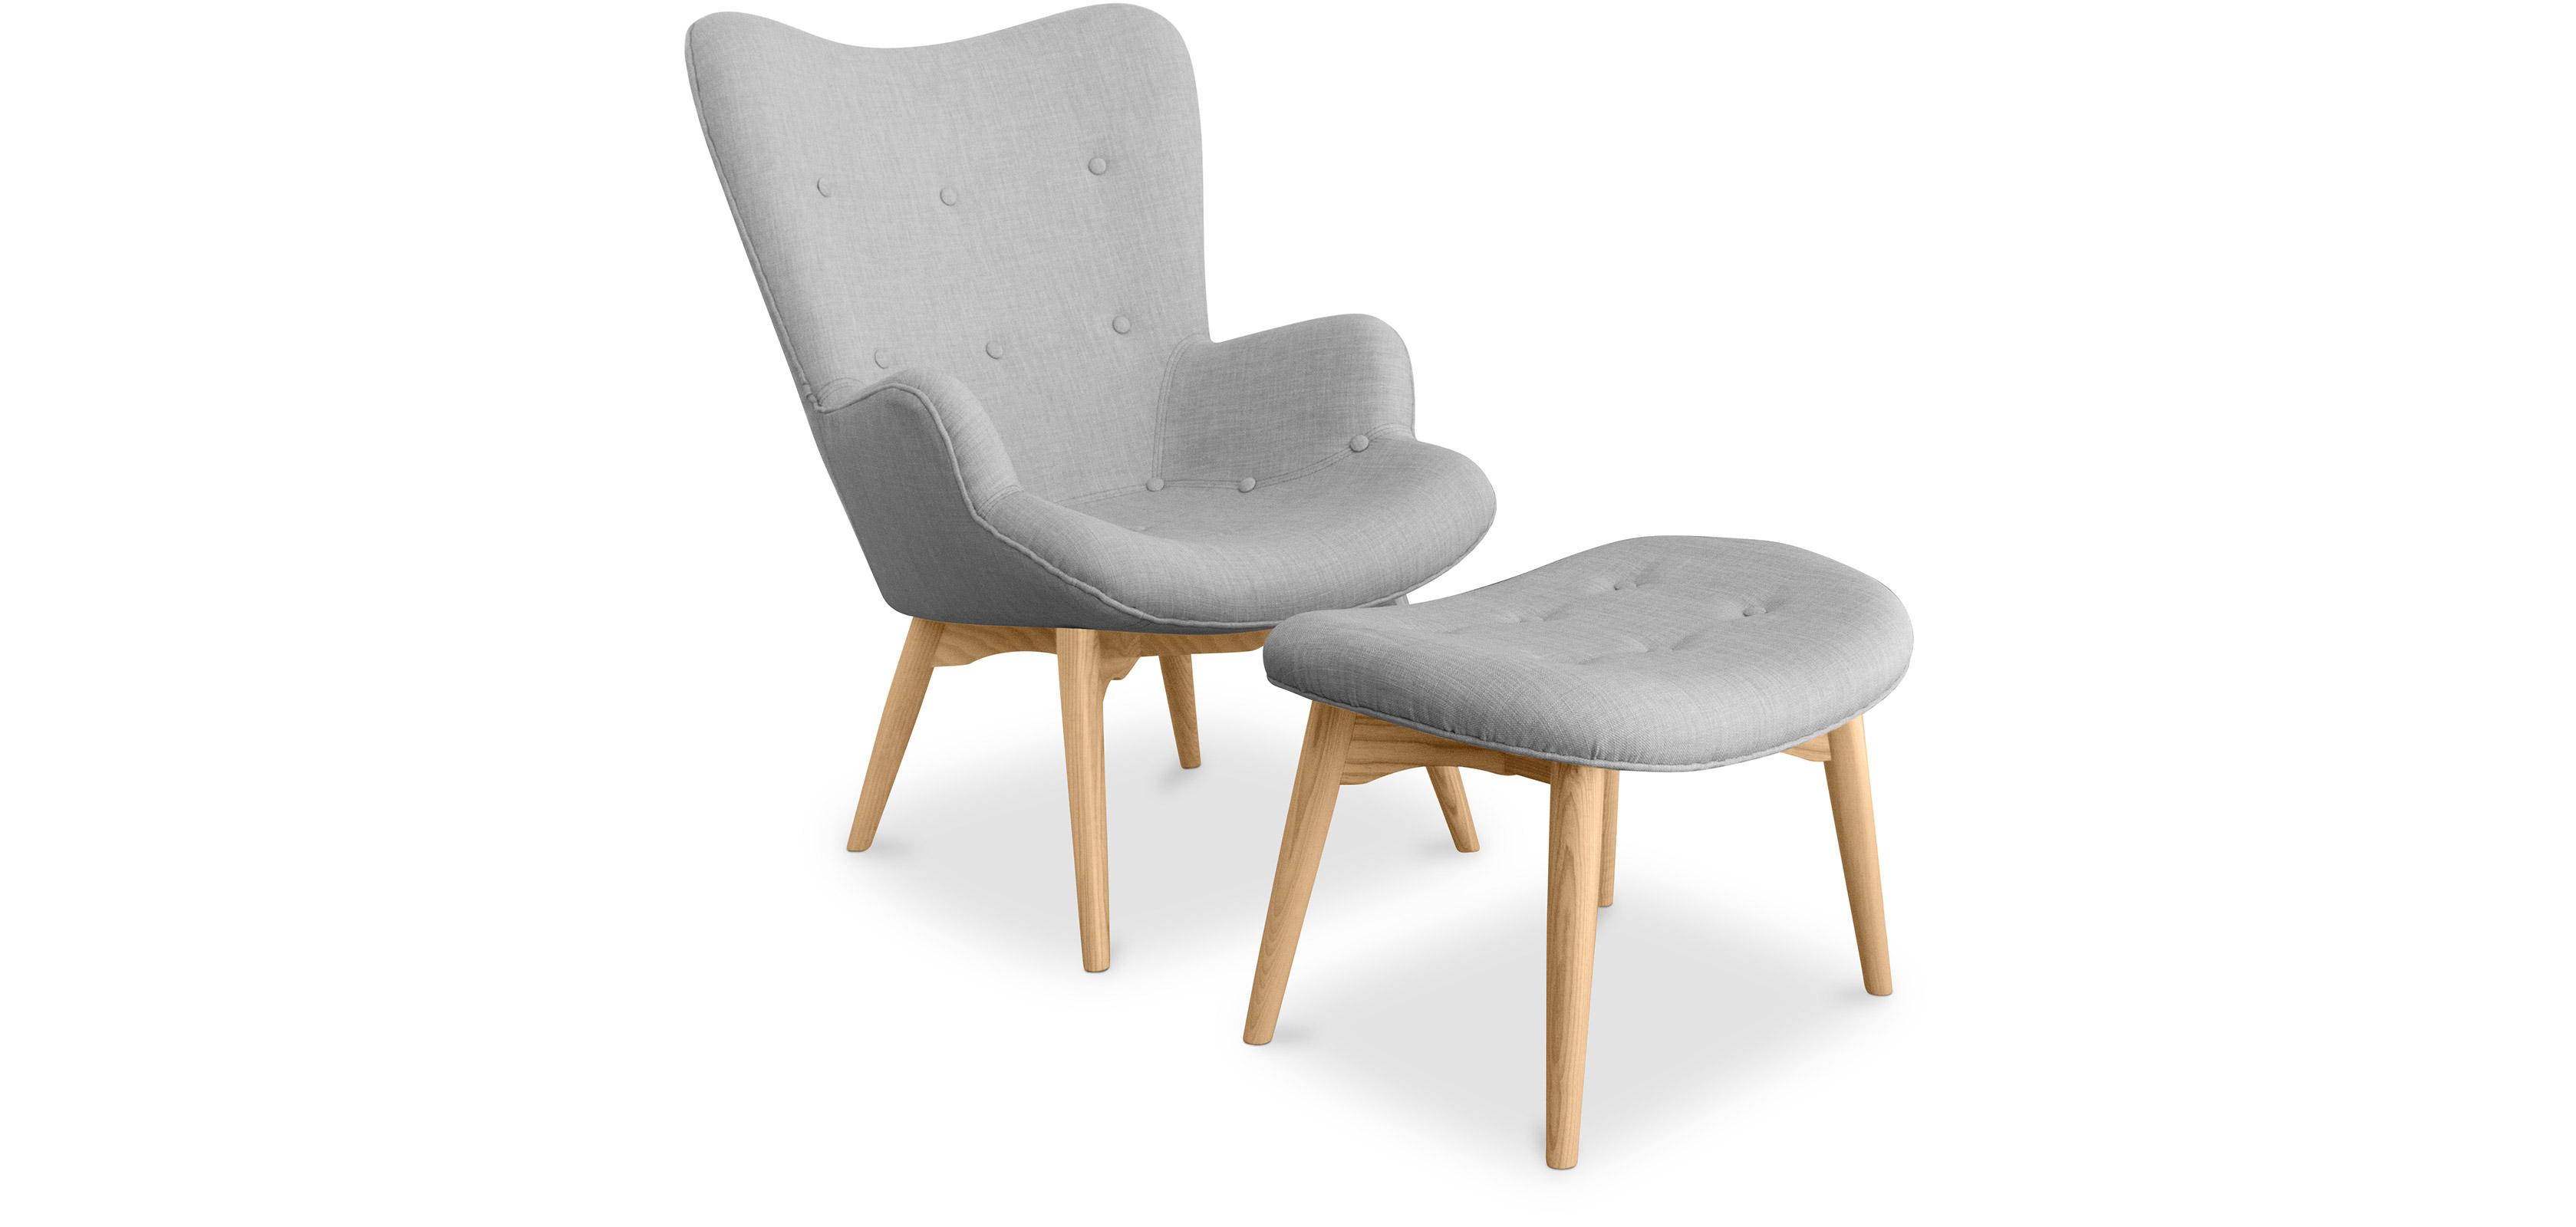 fauteuil avec repose pieds contour design scandinave grant featherston style - Fauteuil Scandinave Avec Repose Pied